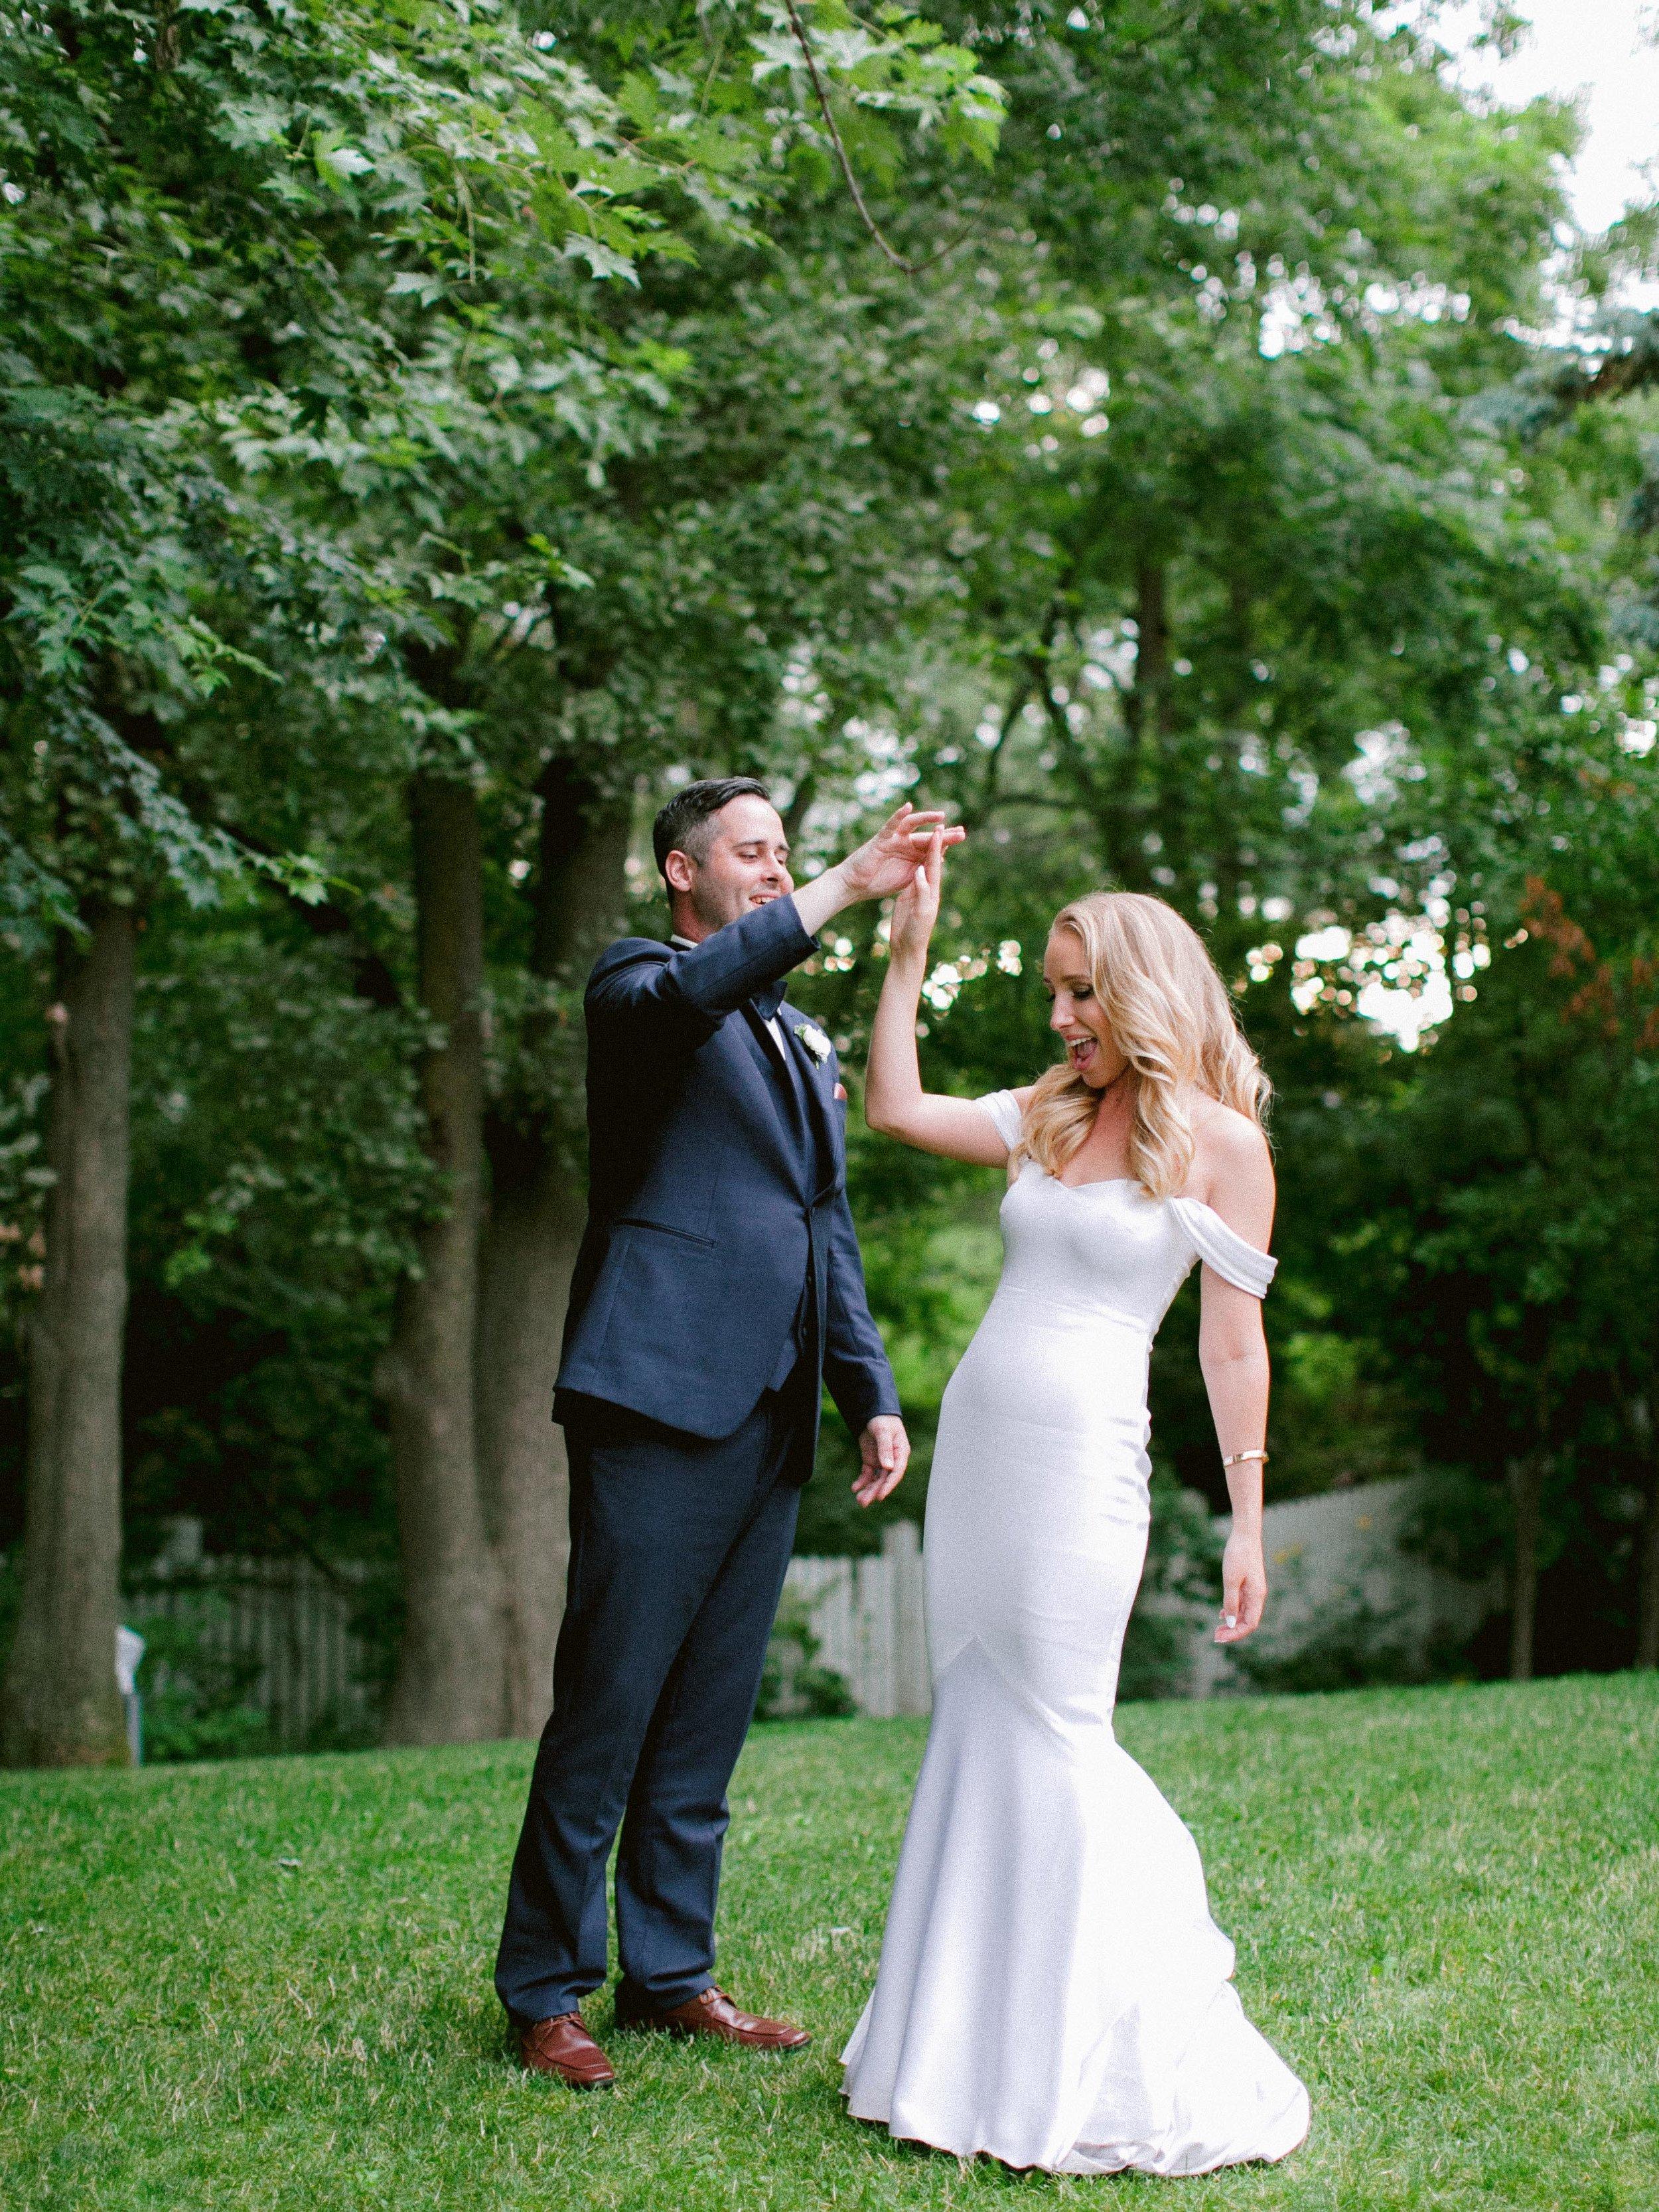 Summer_Engagament_Session_Toronto_Niagara_Wedding_Photographer (2 of 3).jpg